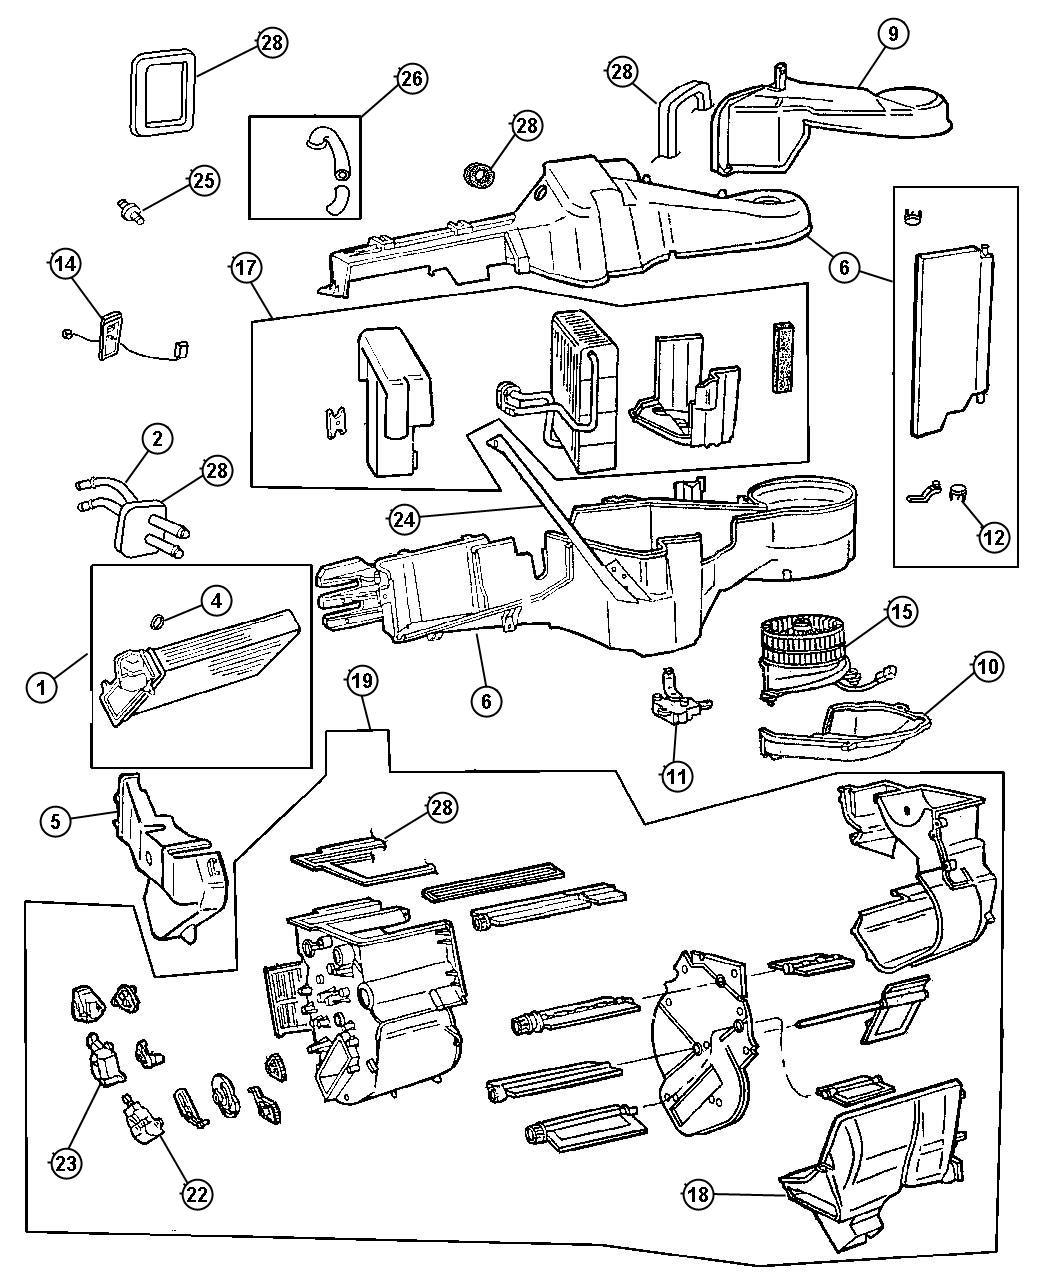 00i32830?resize\\\\\\\\\\\\\\\=665%2C809 trane ycd 060 wiring diagram trane rooftop unit wiring diagram trane ycd090 wiring diagram at aneh.co